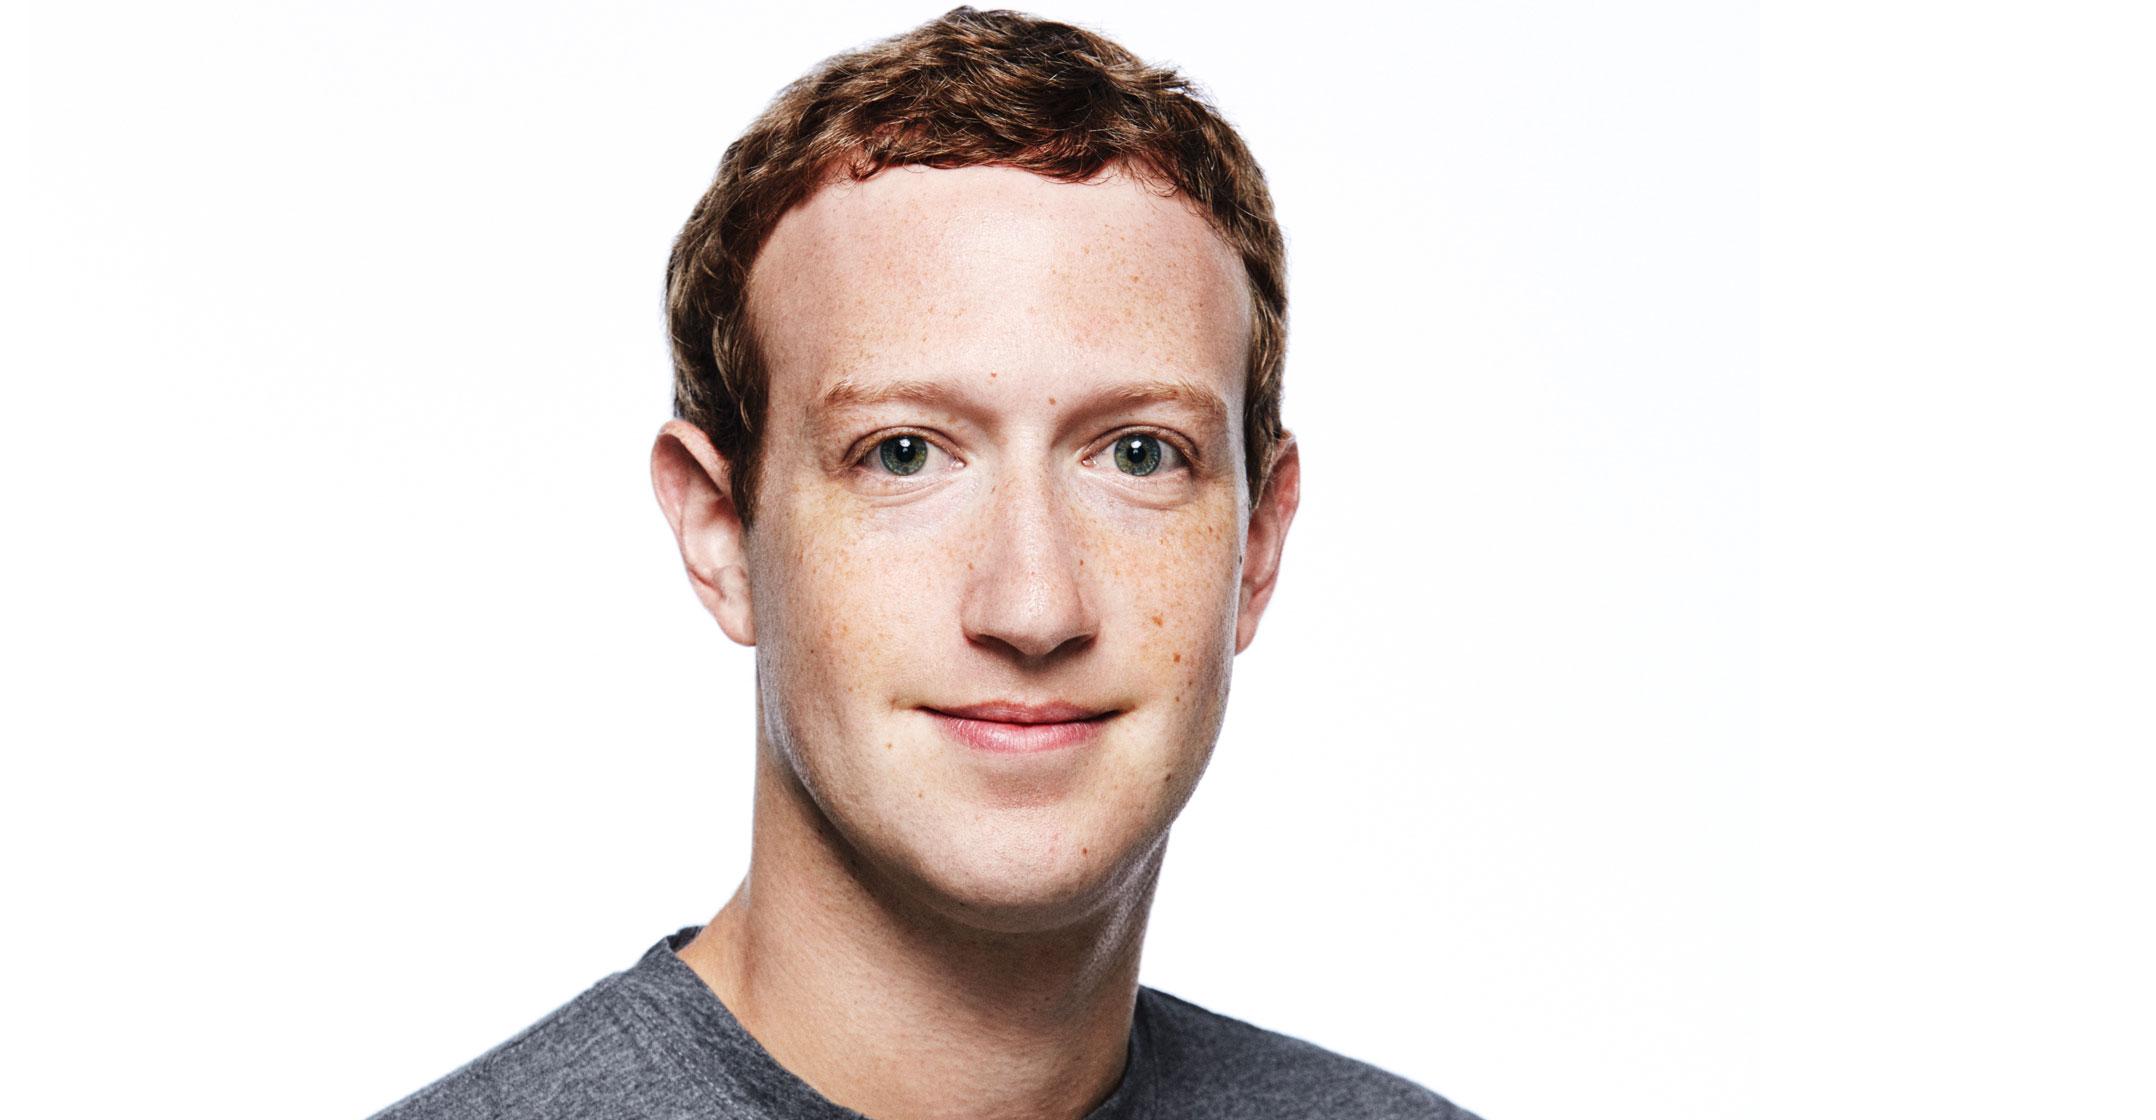 https://techcentral.co.za/wp-content/uploads/2017/05/mark-zuckerberg-2156-1120.jpg